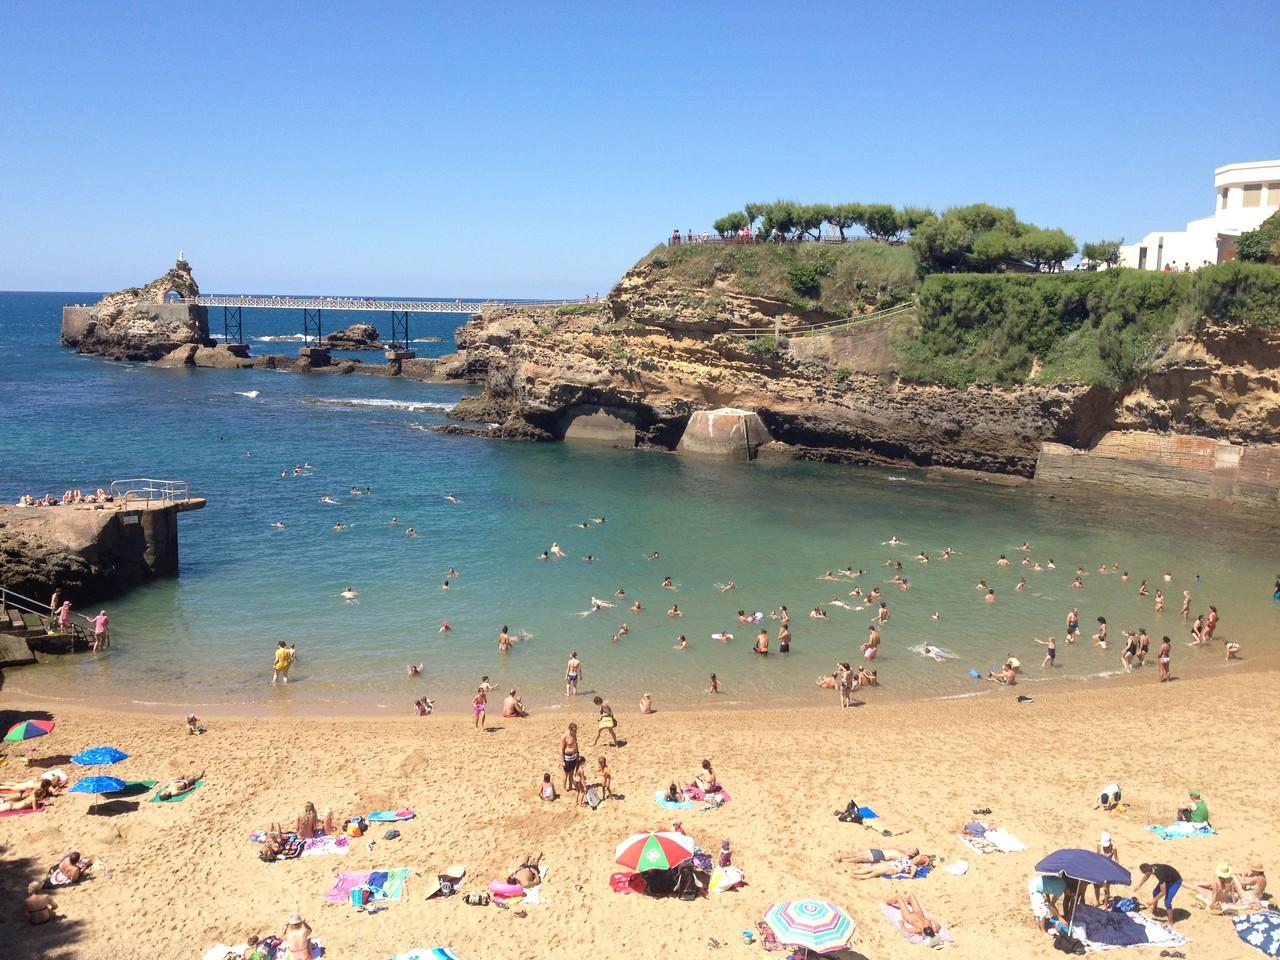 Strand in Biarritz